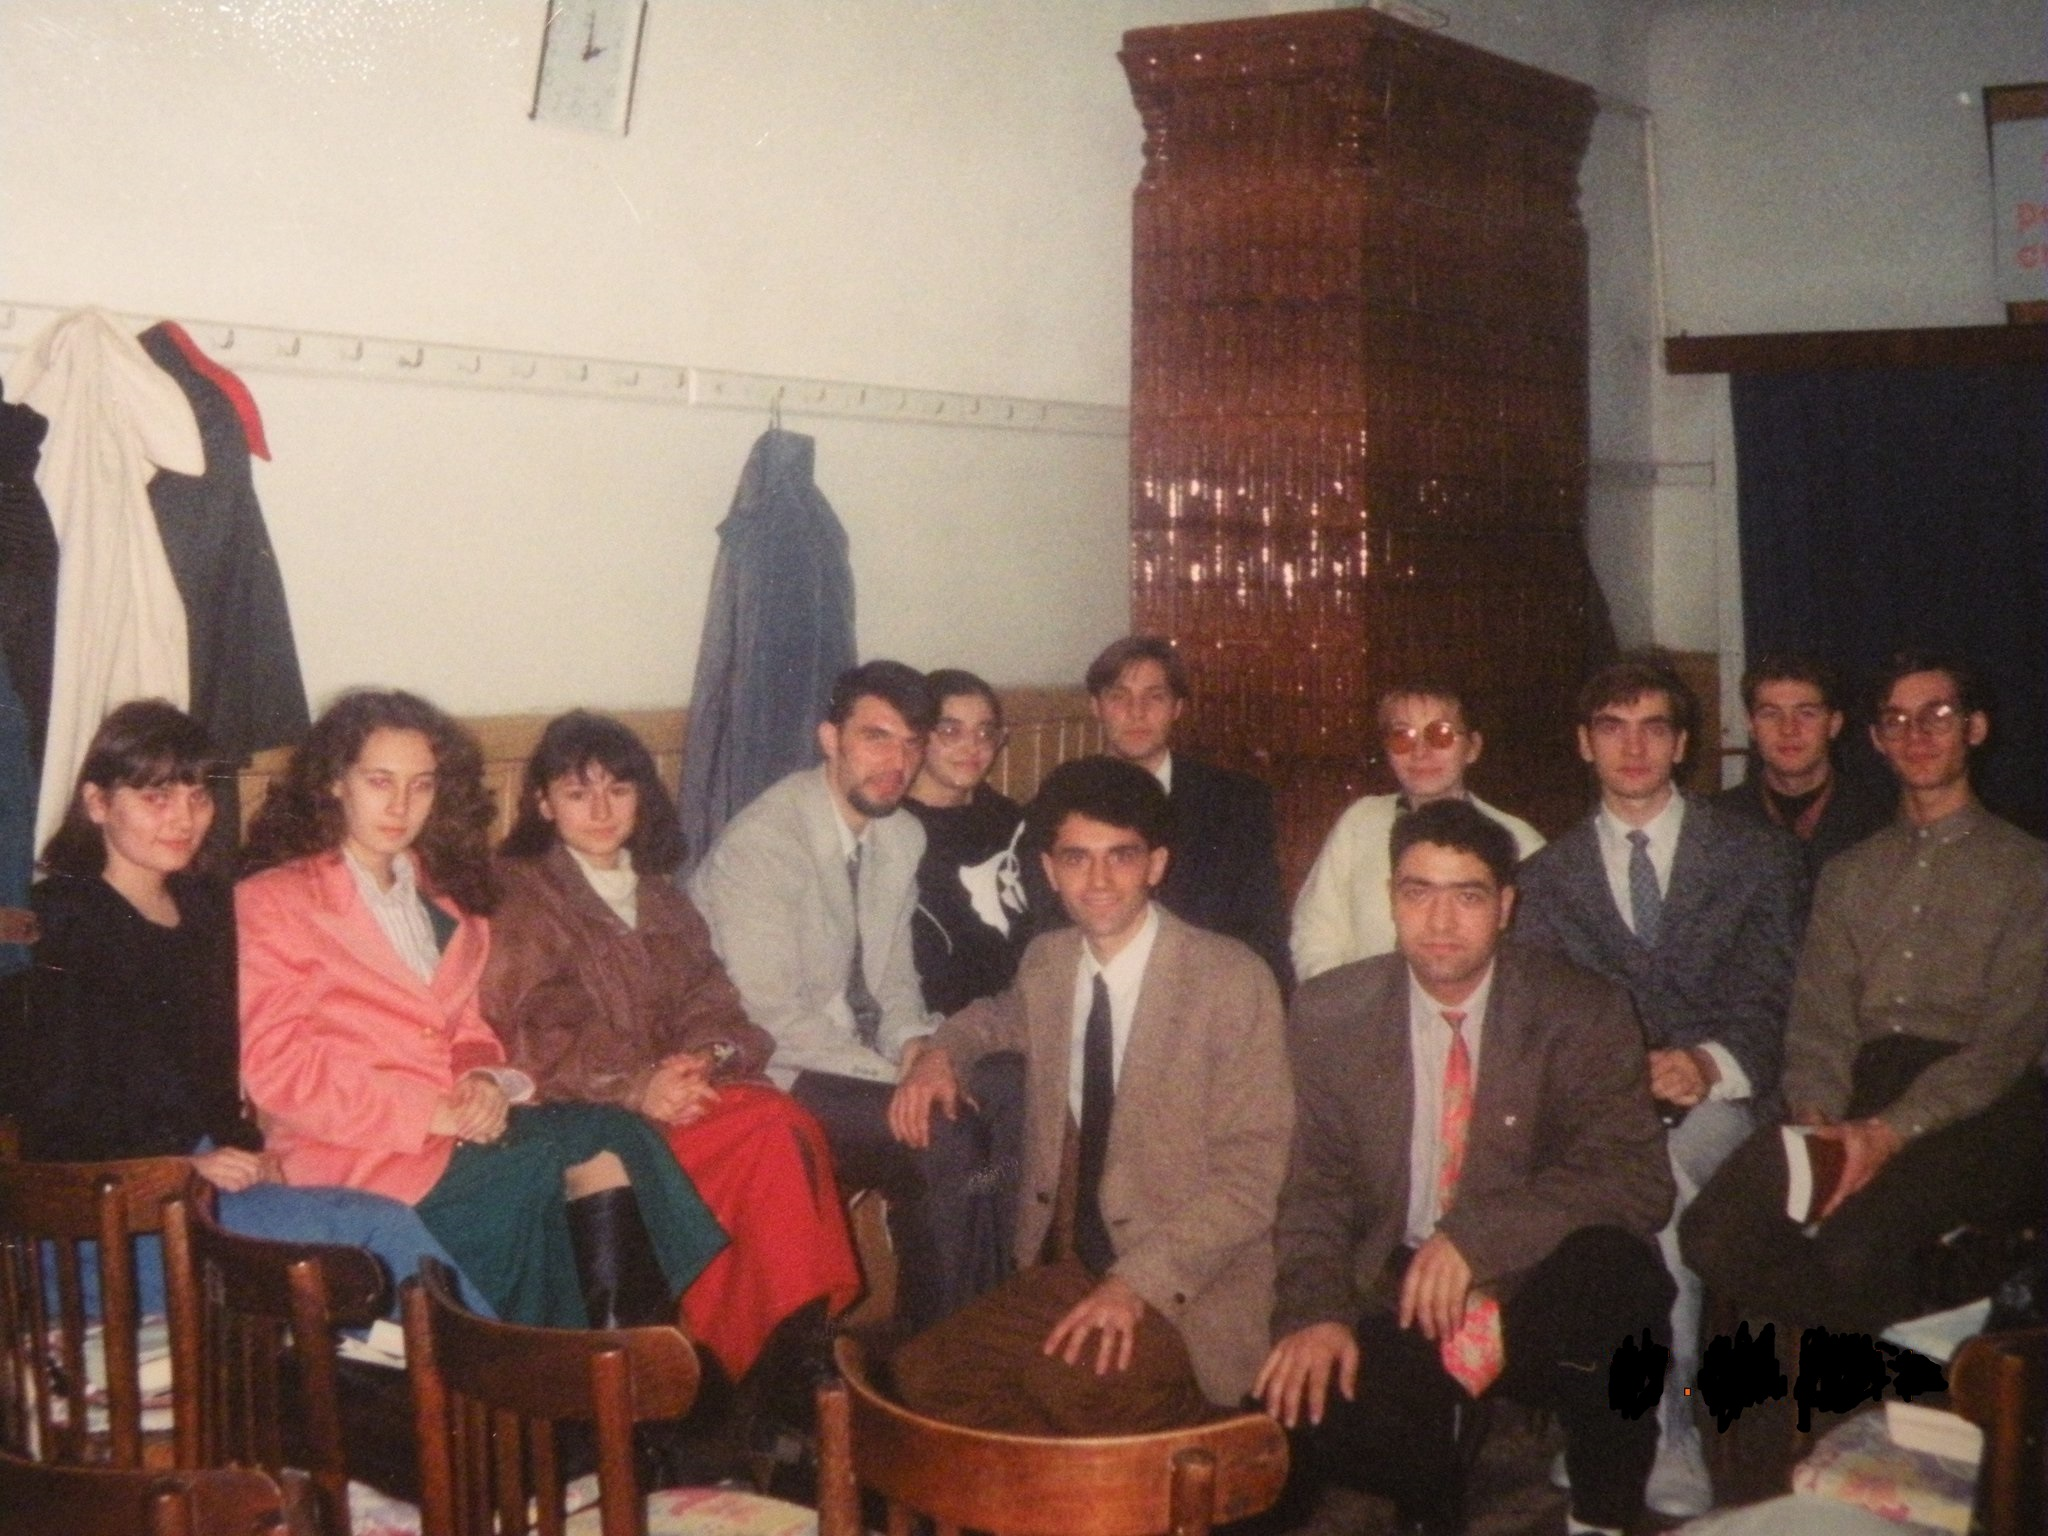 TINERI BISERICA CRESTINA DUPA EVANGHELIE DRAGOS VODA BUCURESTI 1997